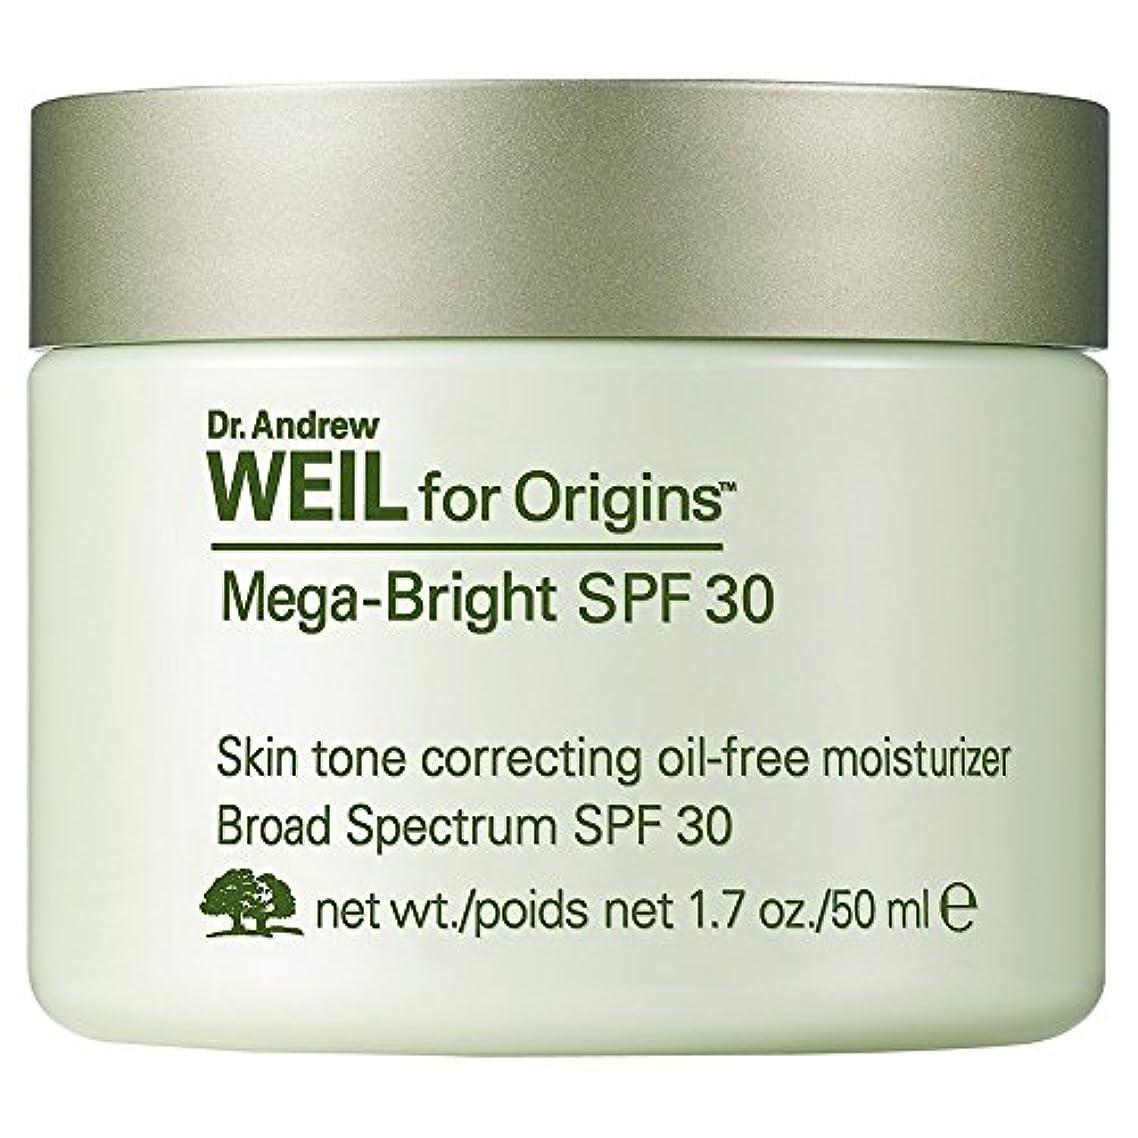 Dr。保湿、50ミリリットルの補正アンドルー?ワイルメガブライトSpf30の肌のトーン (Origins) (x2) - Dr. Andrew Weil Mega-Bright SPF30 Skin Tone Correcting...